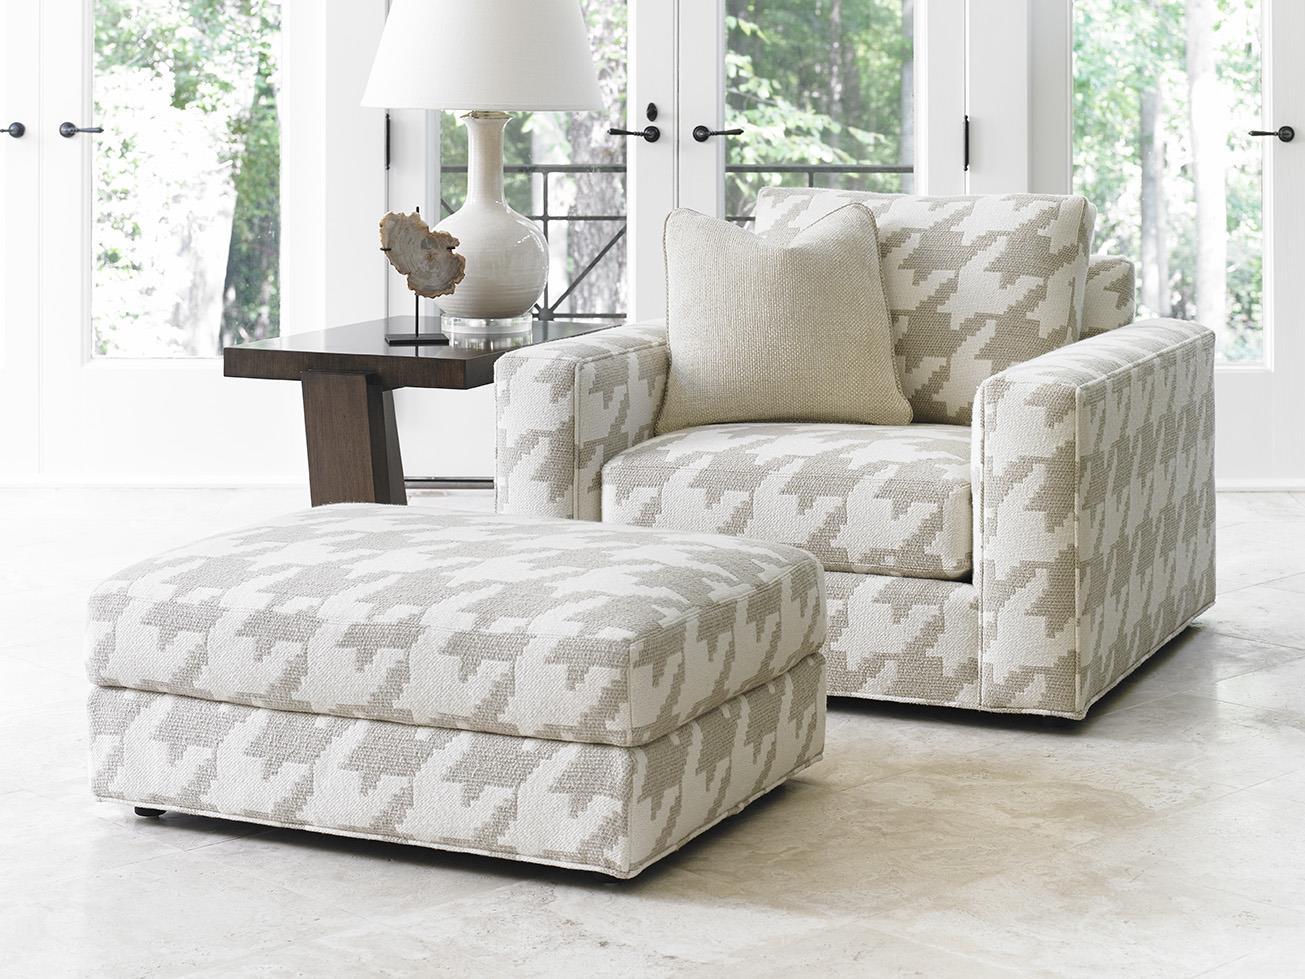 oversized upholstered chair foldable rocking lexington laurel canyon bellevue belfort